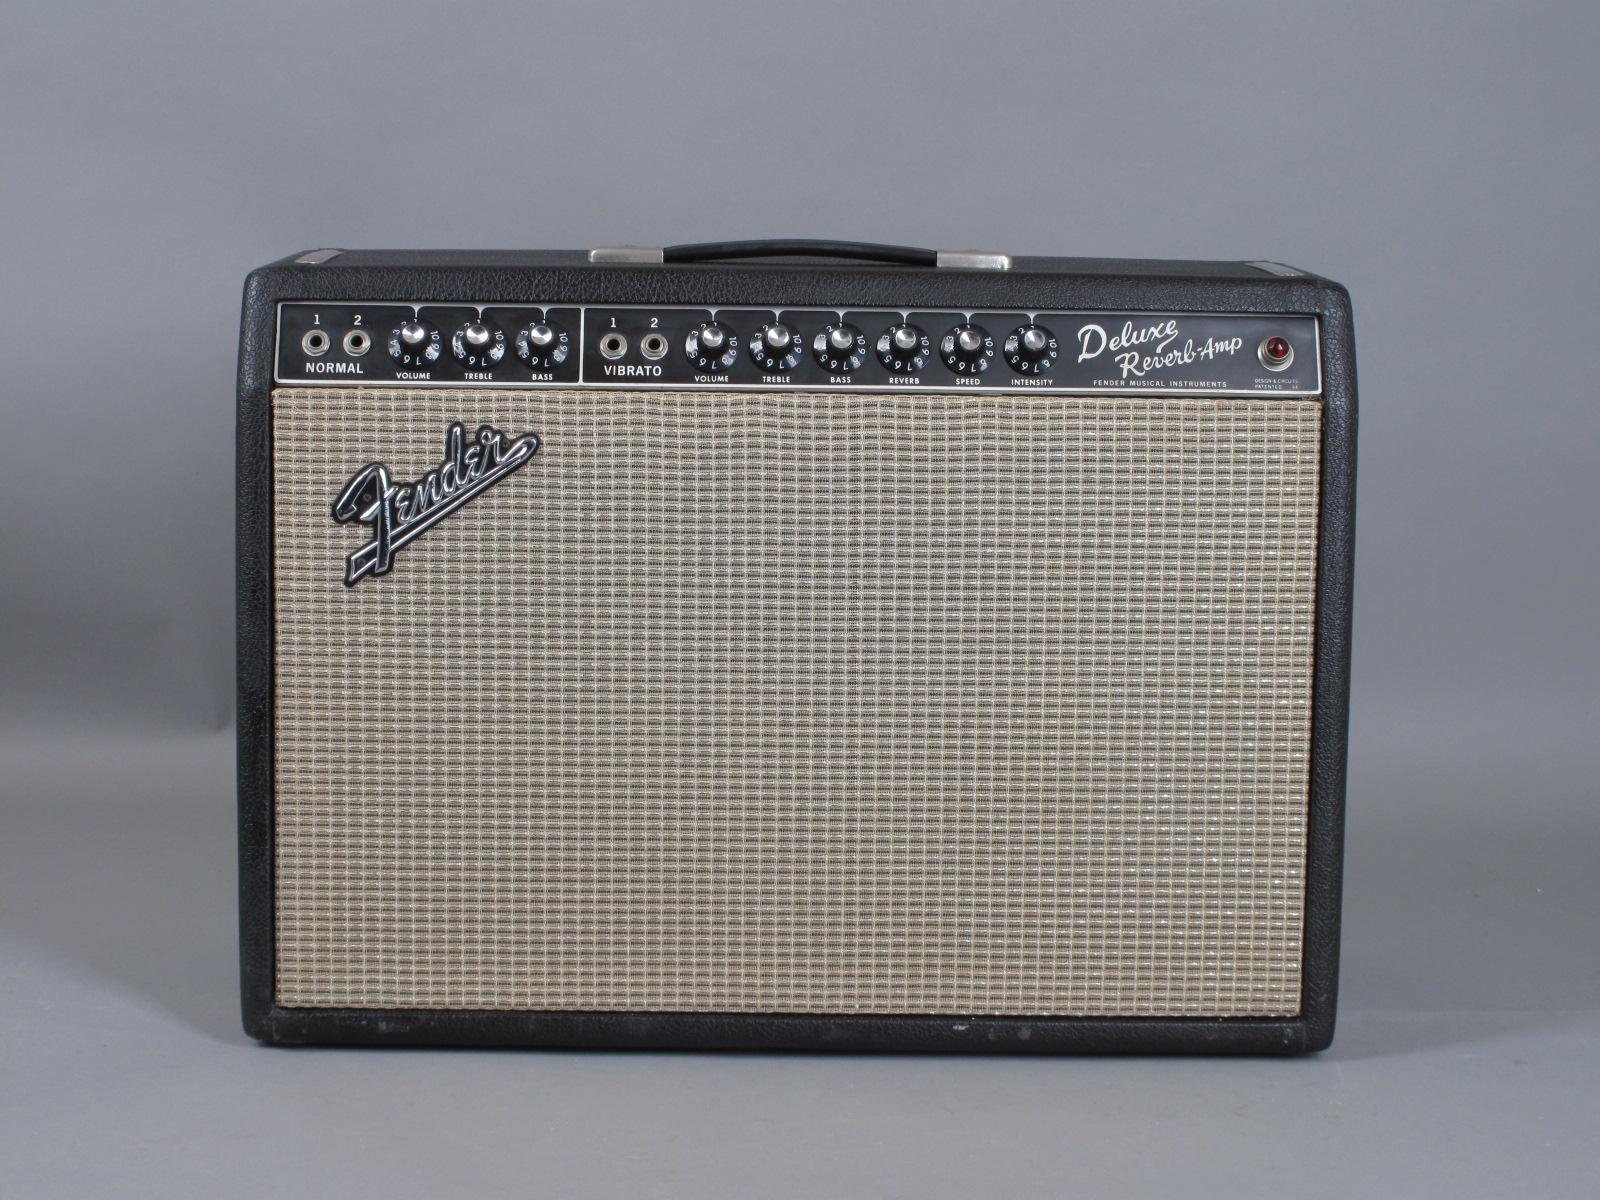 1967 Fender Deluxe Reverb Amp - Blackface - Clean